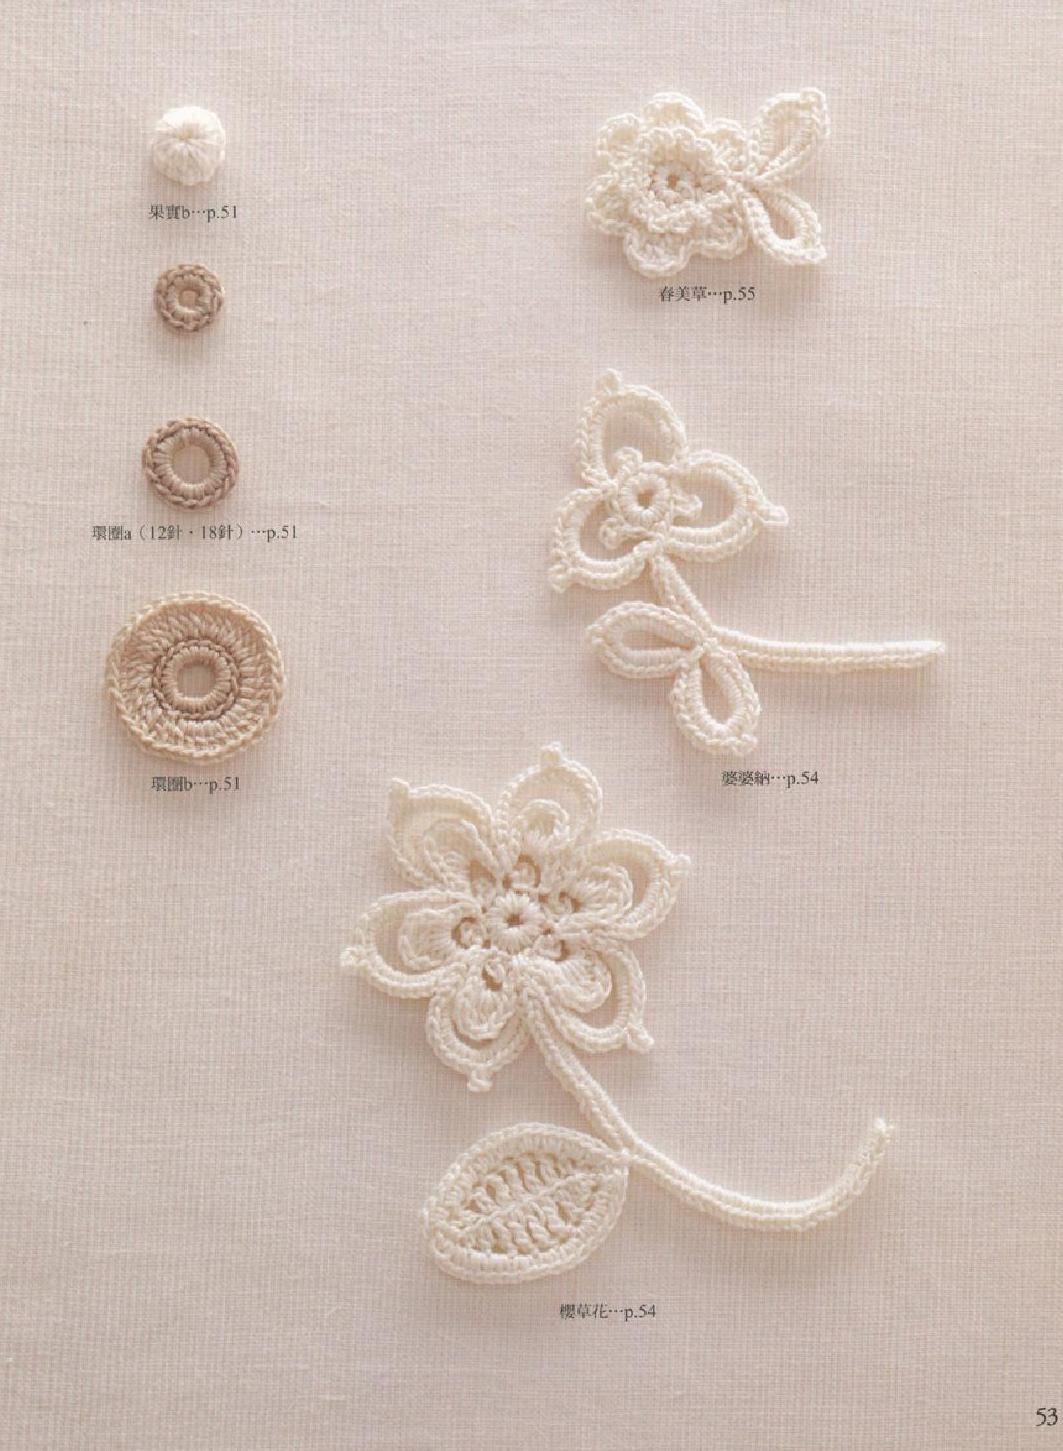 #ClippedOnIssuu from Knitting03 006